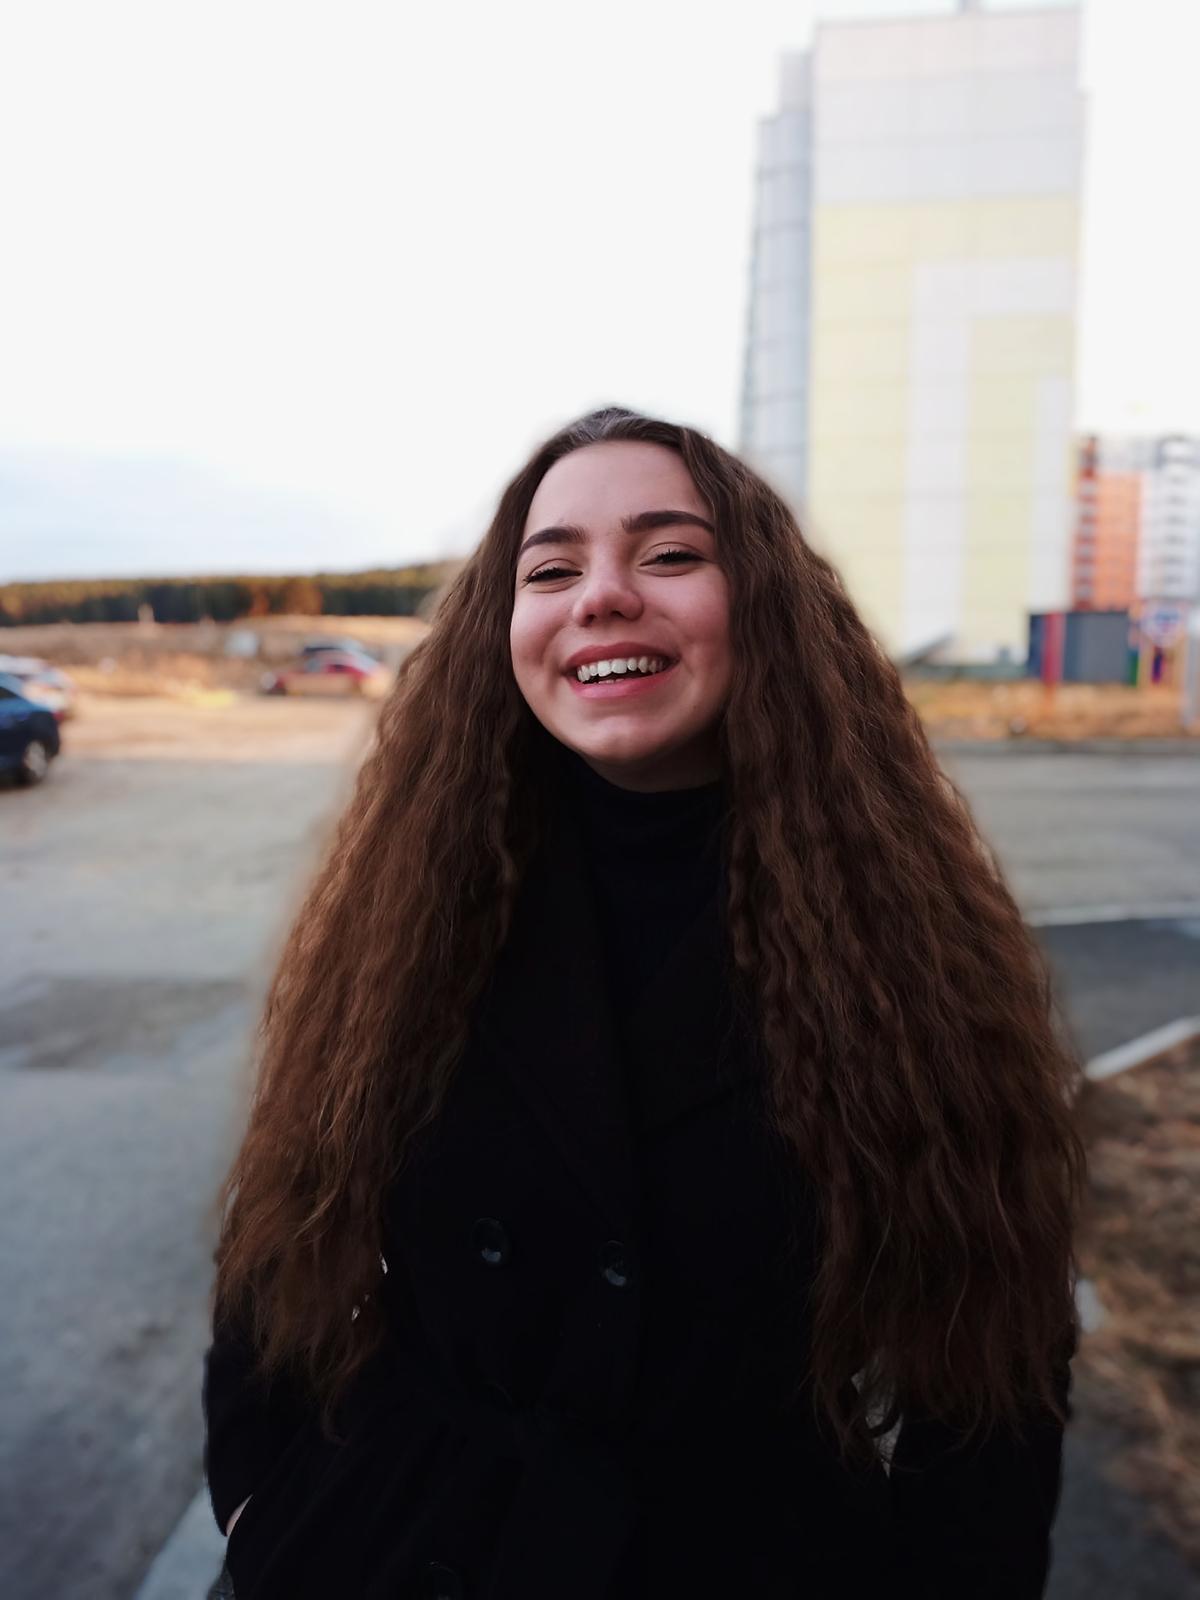 Архипова Дарья Игоревна